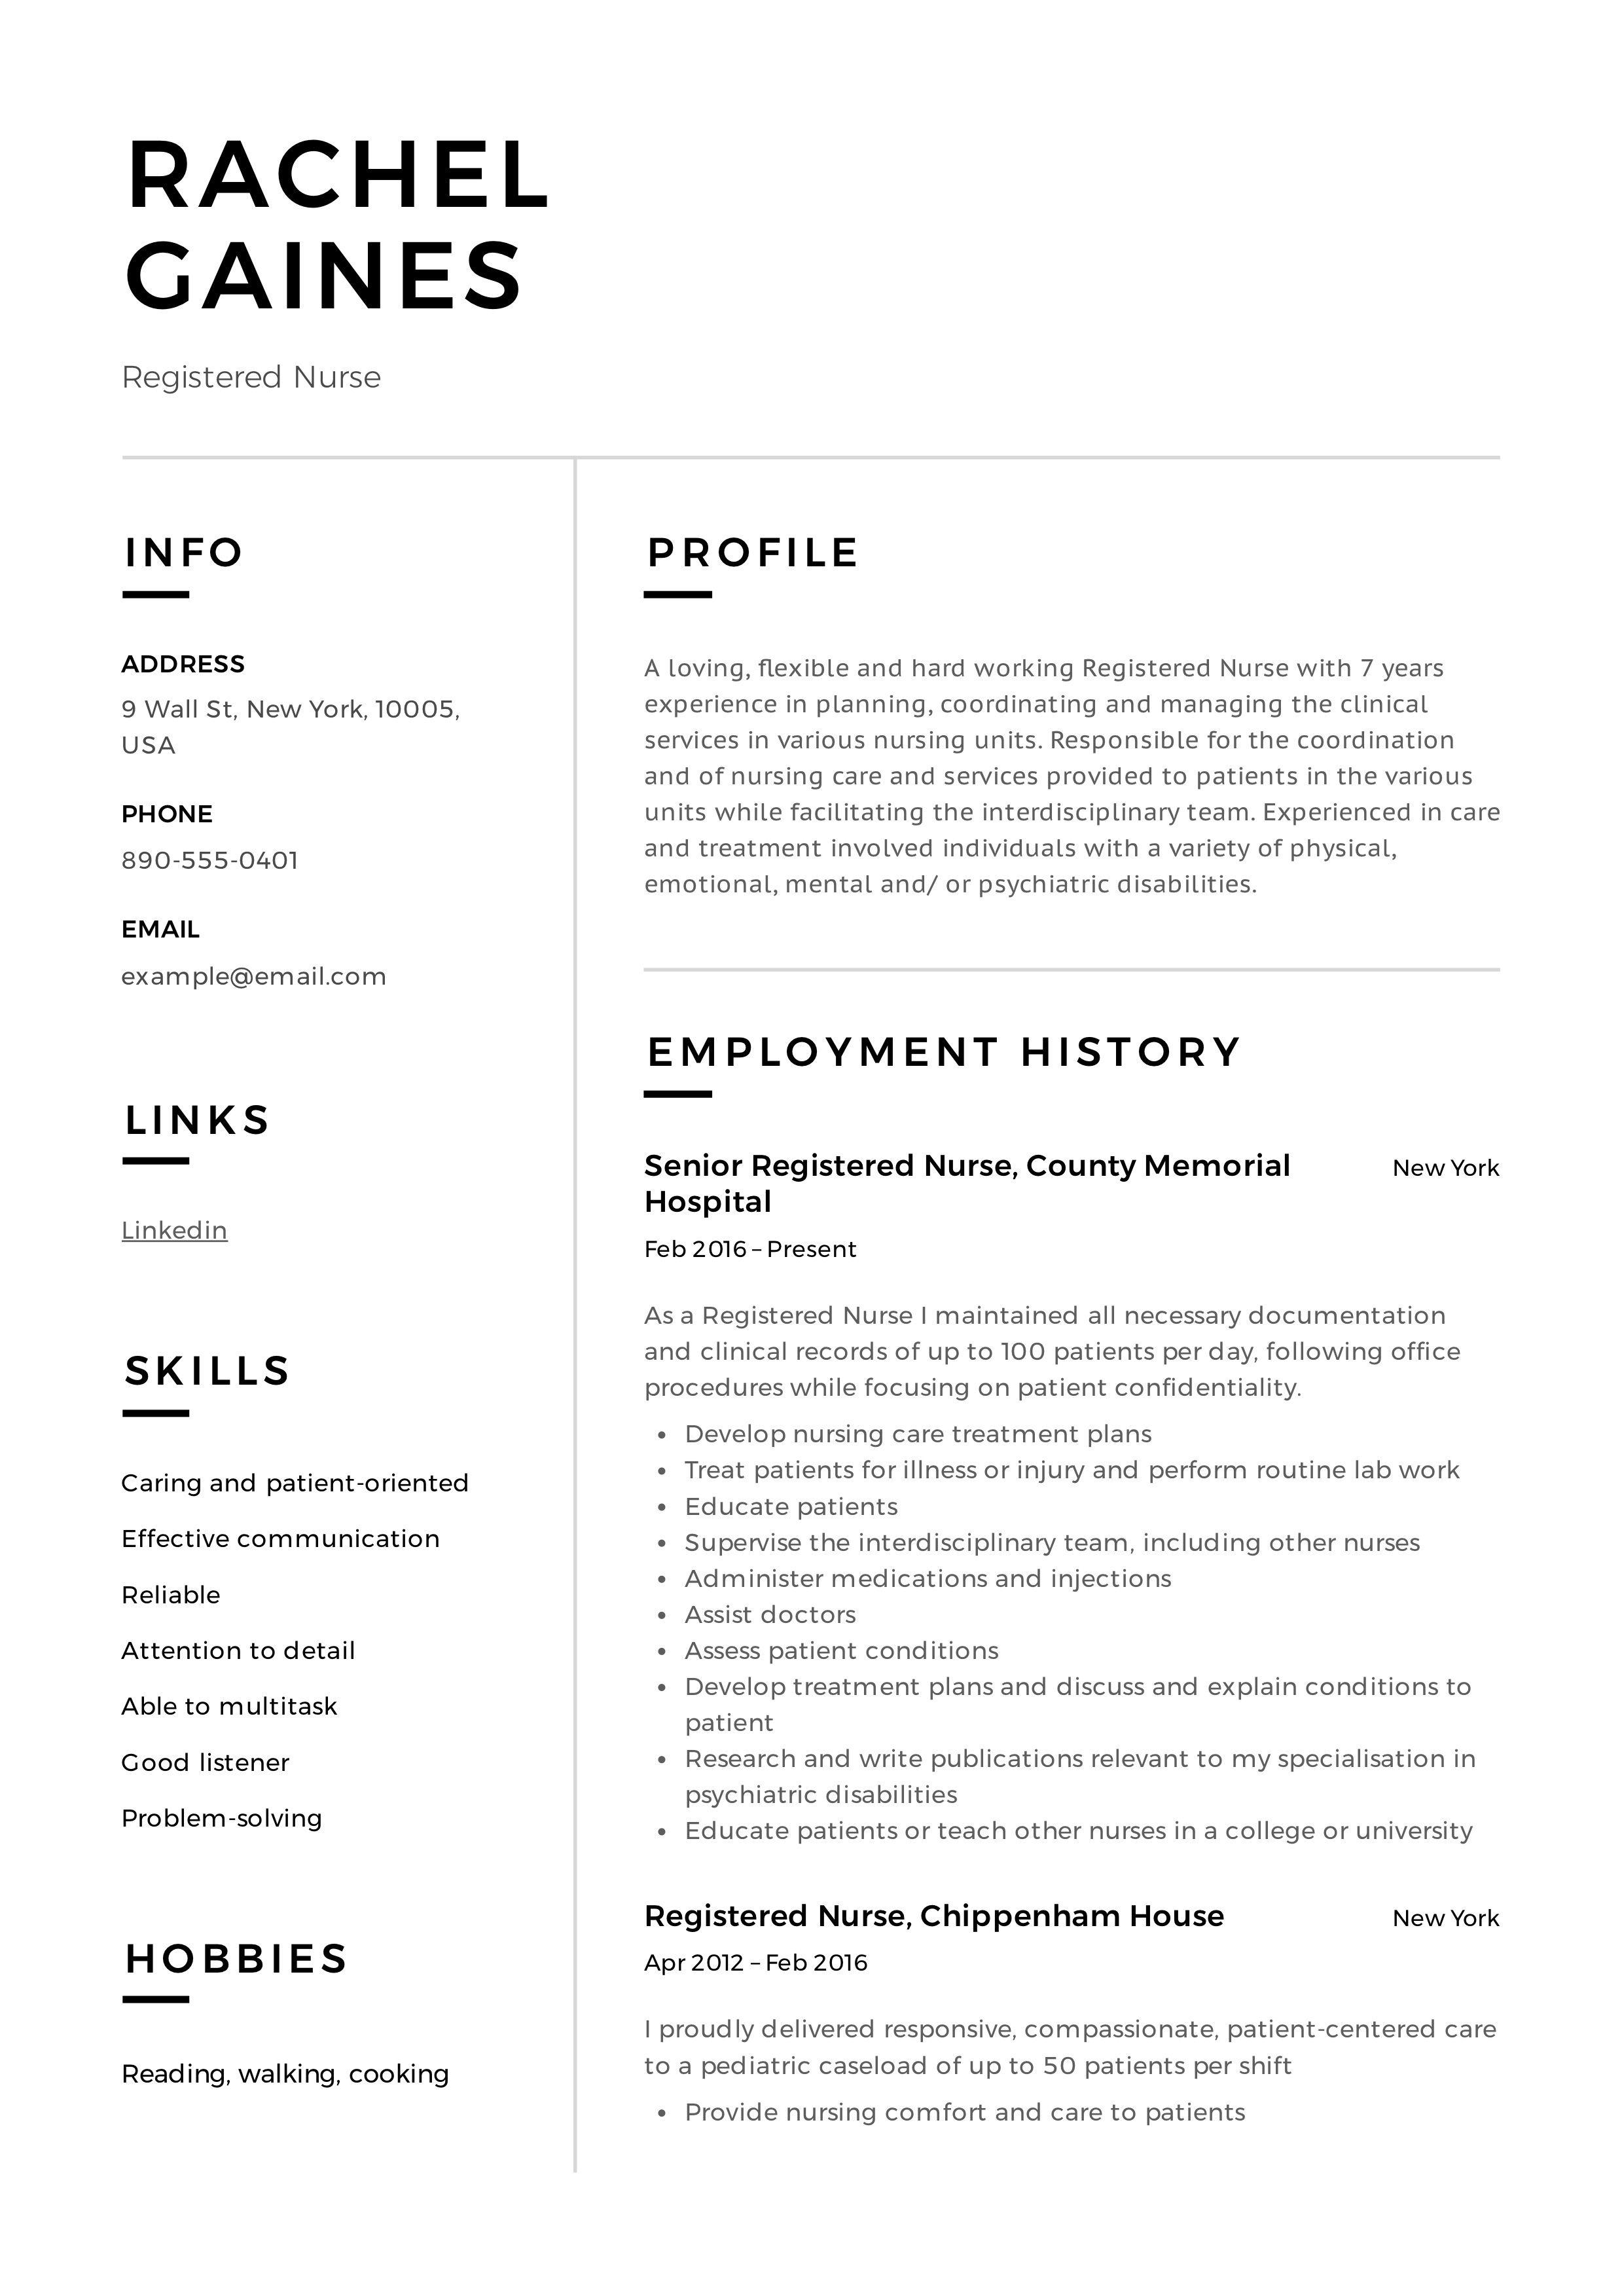 Free Resume Templates For Lpn Nurses Freeresumetemplates Nurses Resume Templates Nursing Resume Template Lpn Resume Nursing Resume Examples